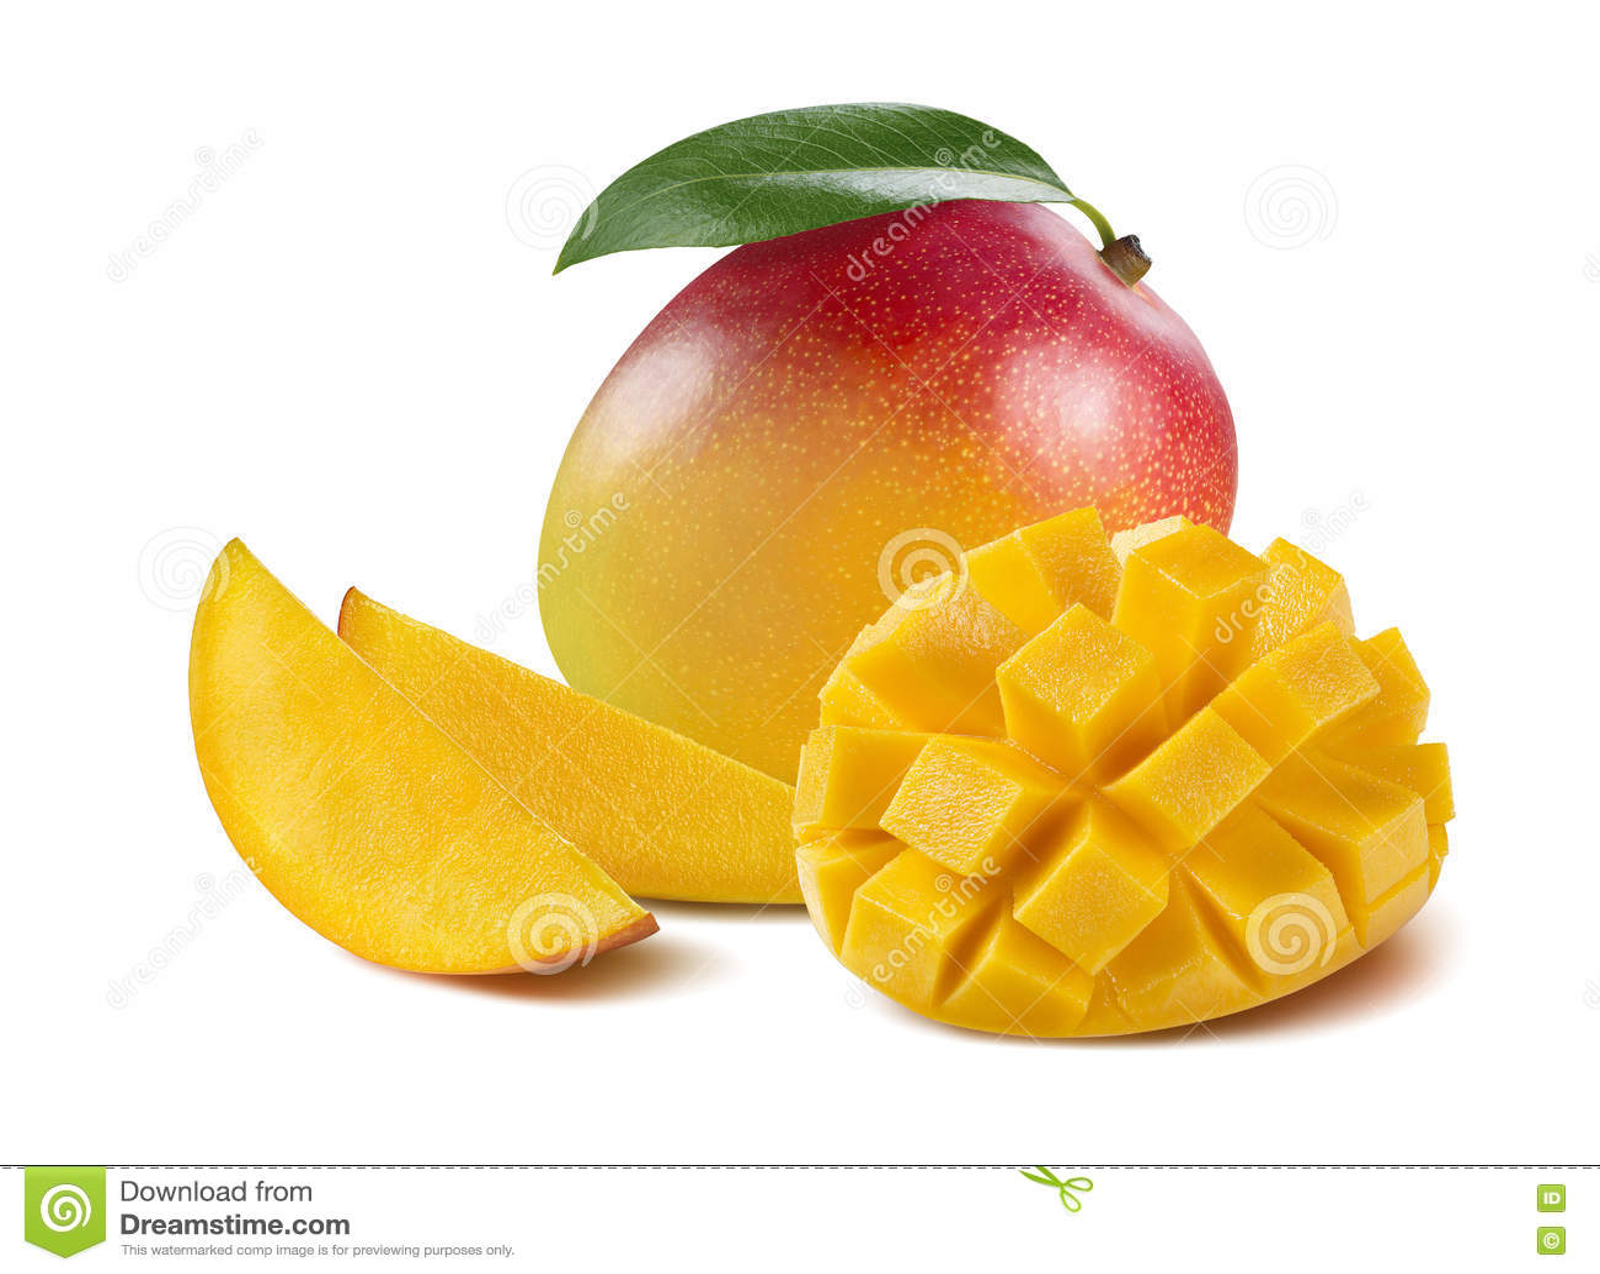 Mangoposition Cut Piece Slice On White Background Stock Photo Mango Bravo